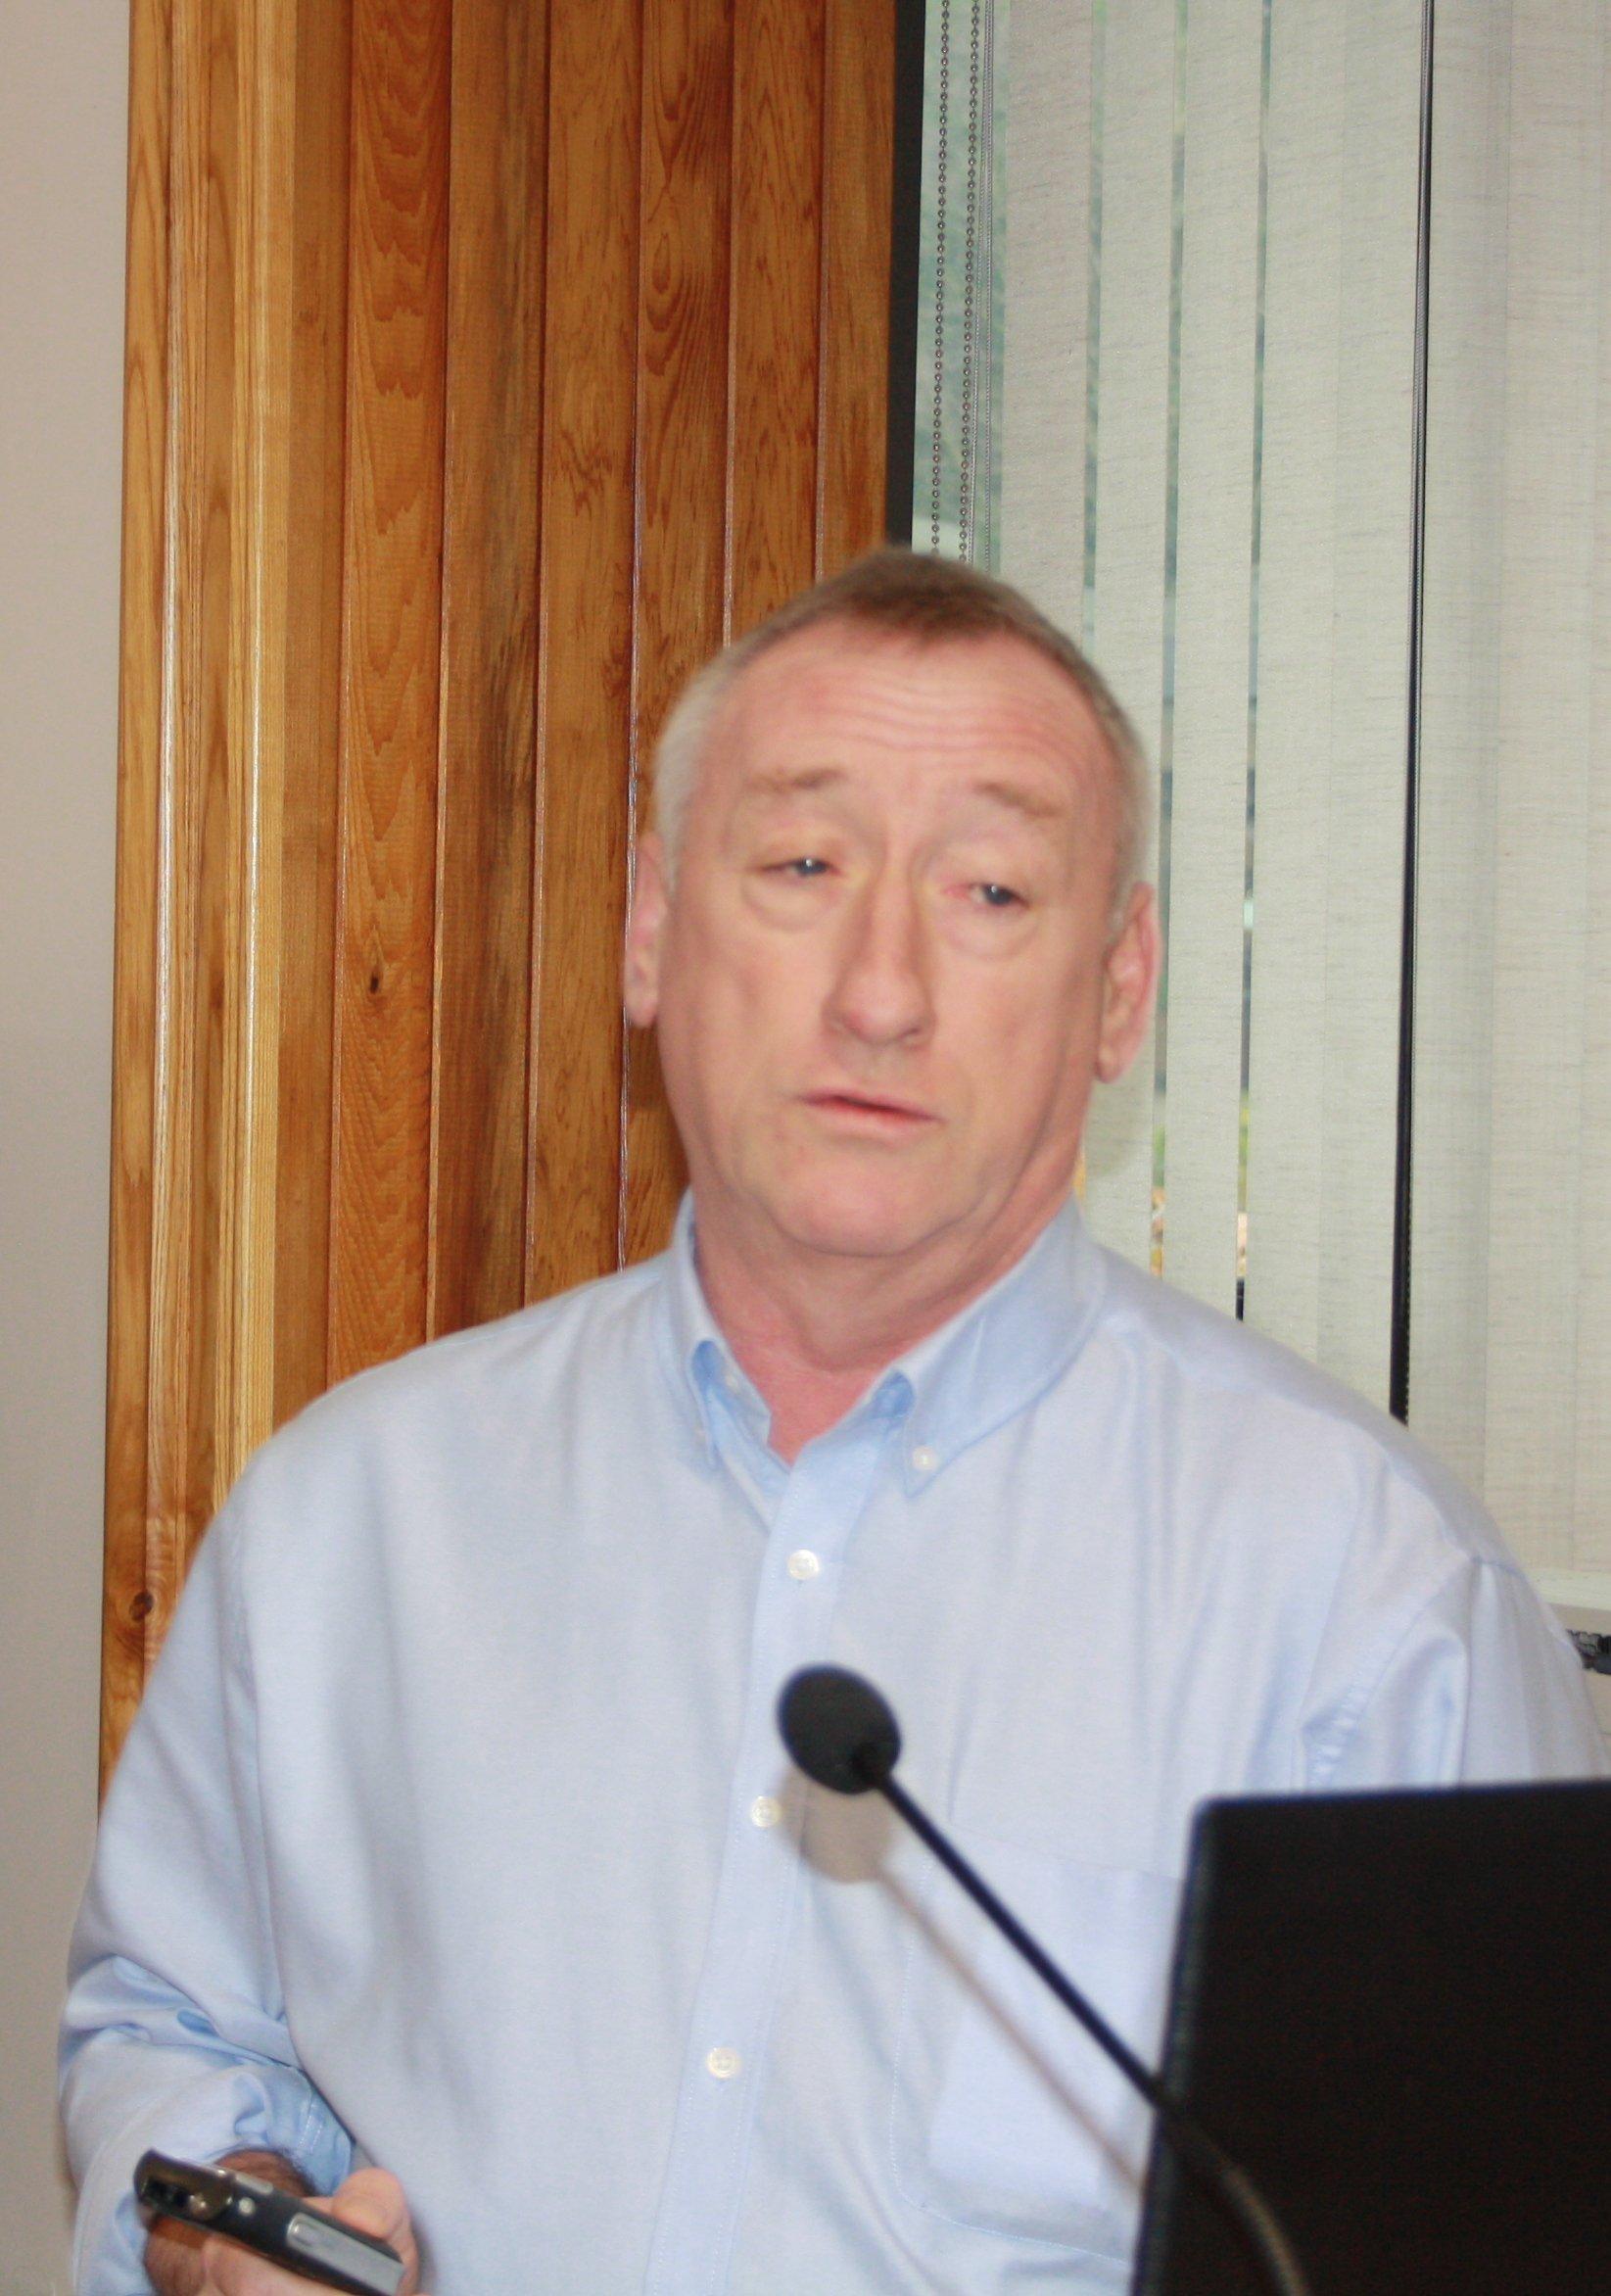 Dr Patrick Fitzgerald